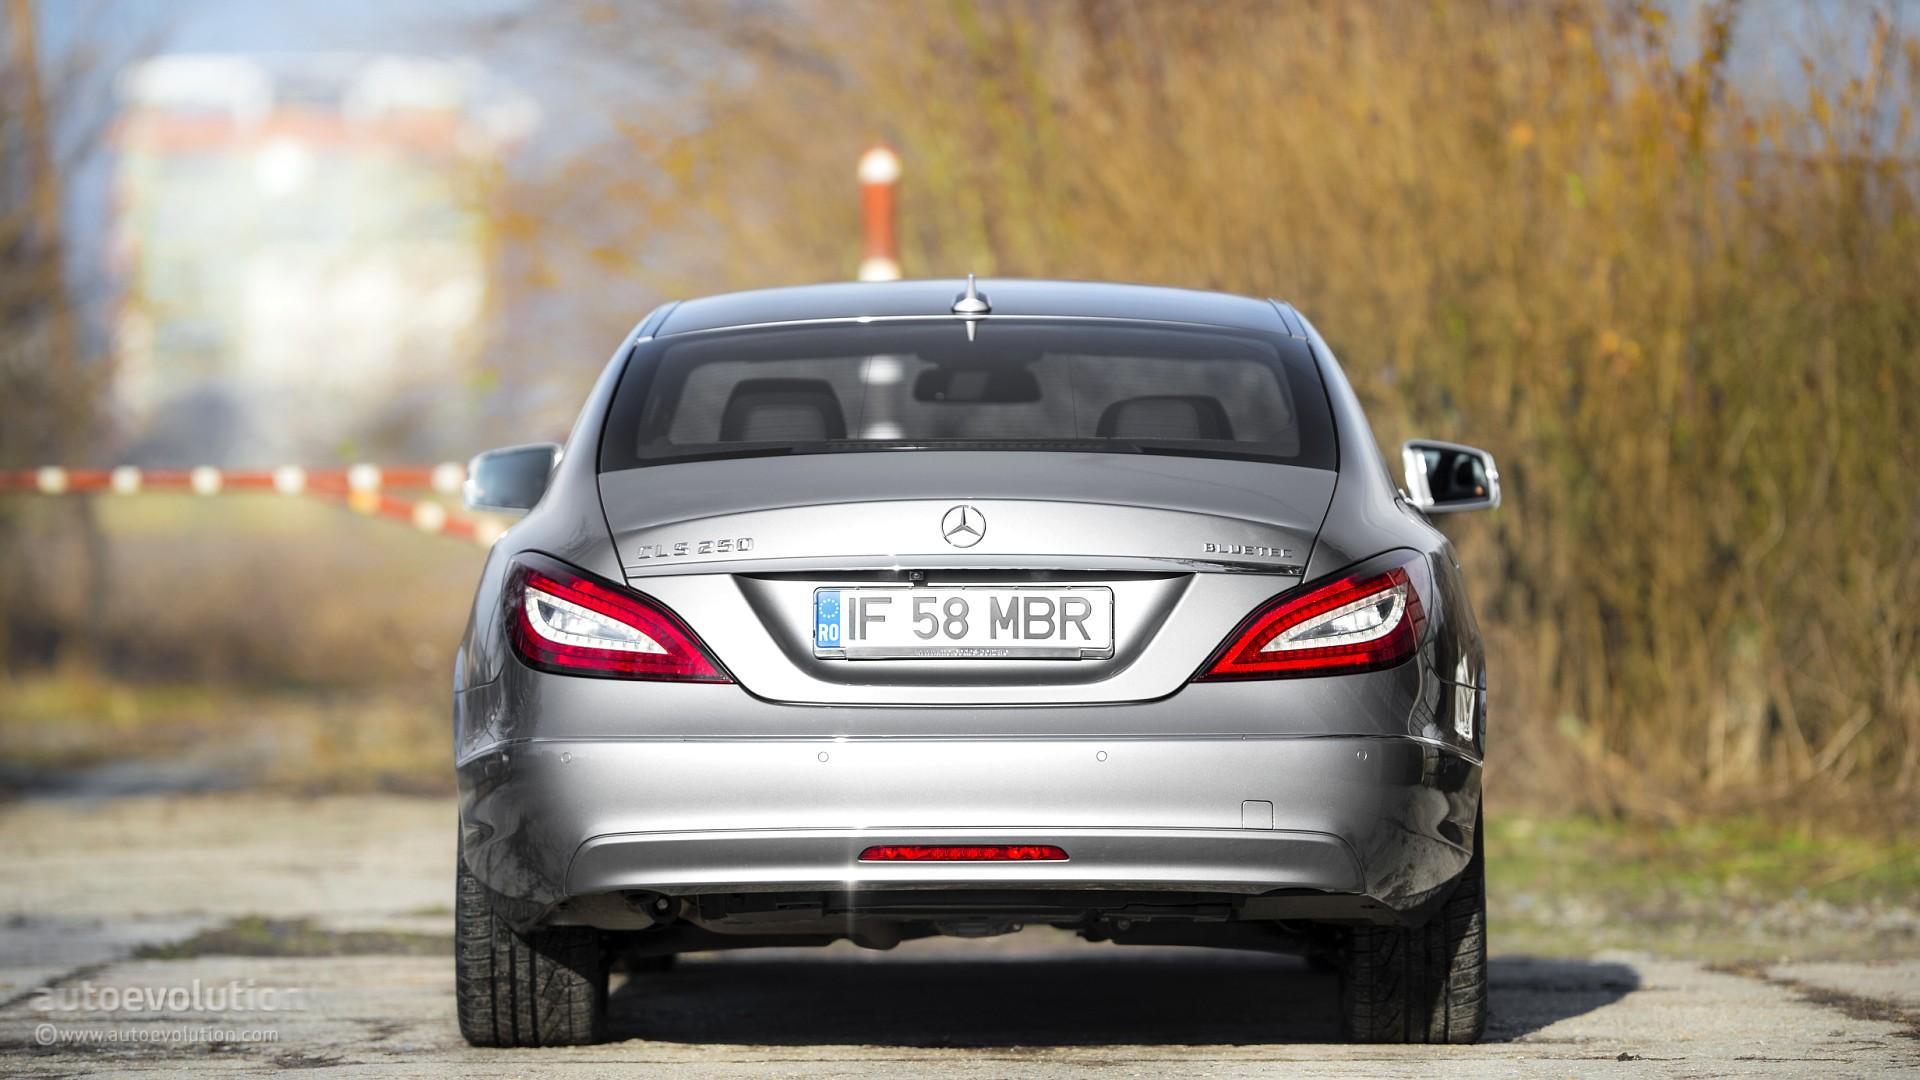 2015 mercedes benz cls class review autoevolution for Mercedes benz cls series